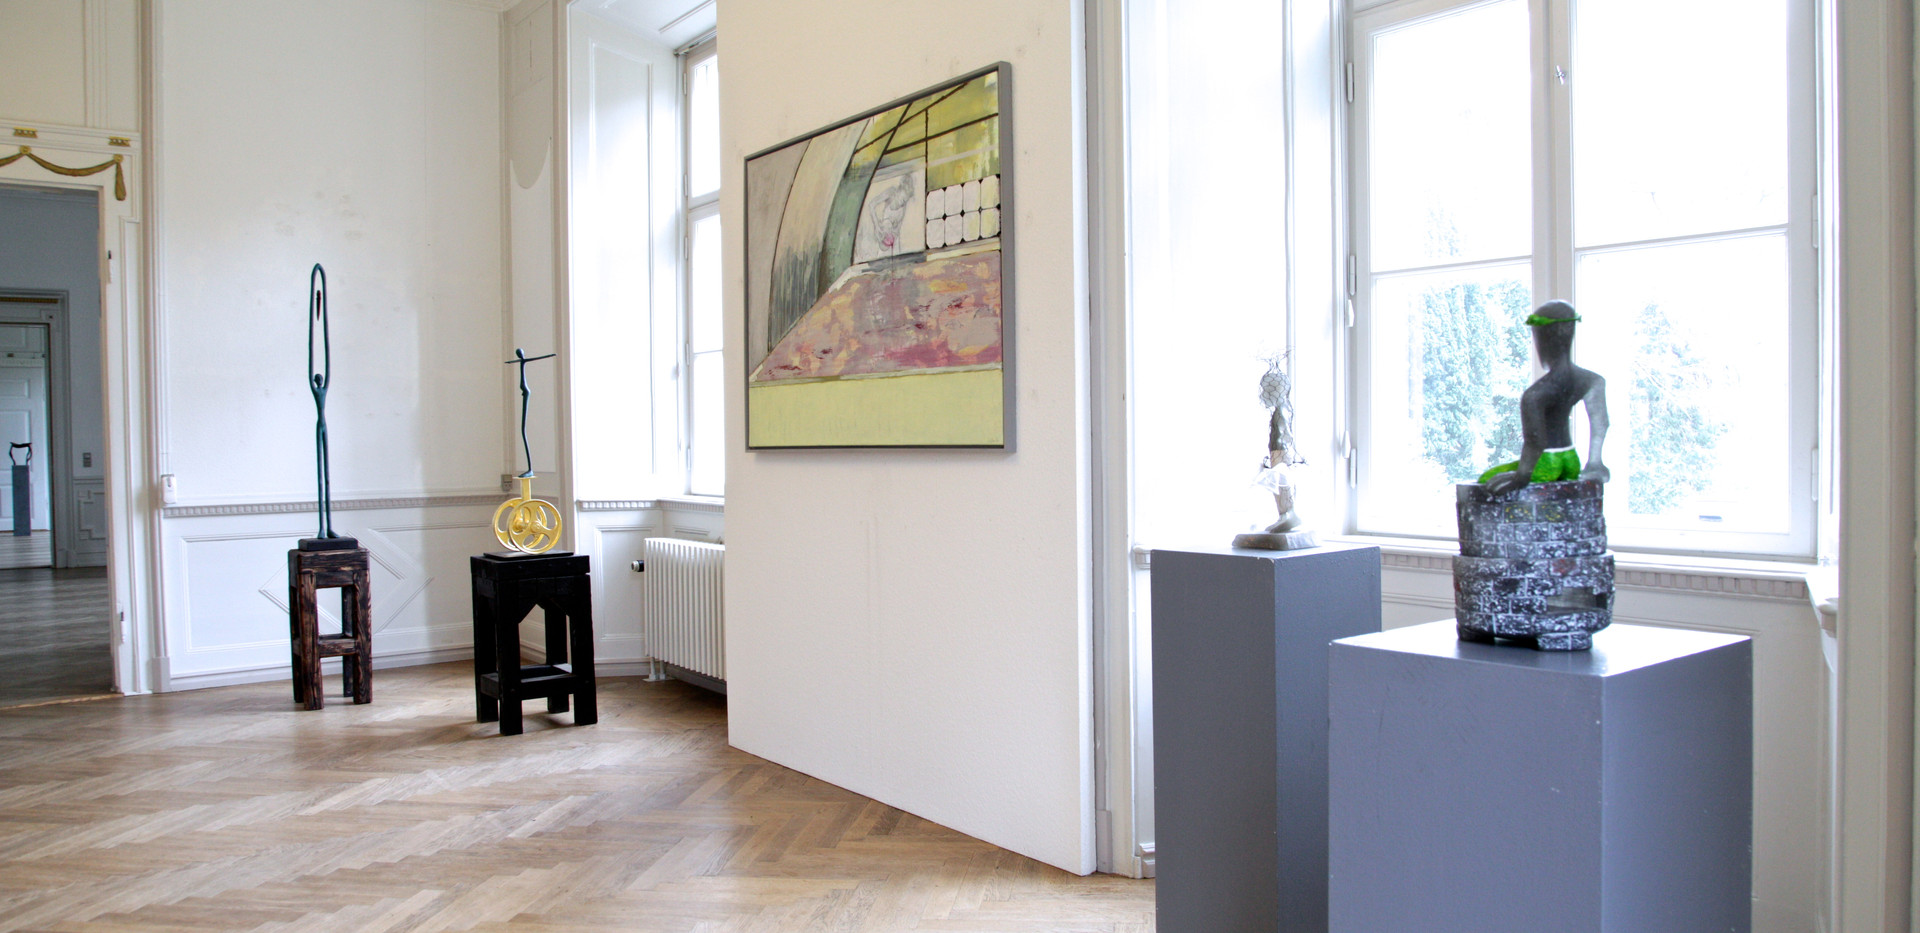 Künstler:  Arno Falk Wübke Rolf-Grigull Hartman Greb